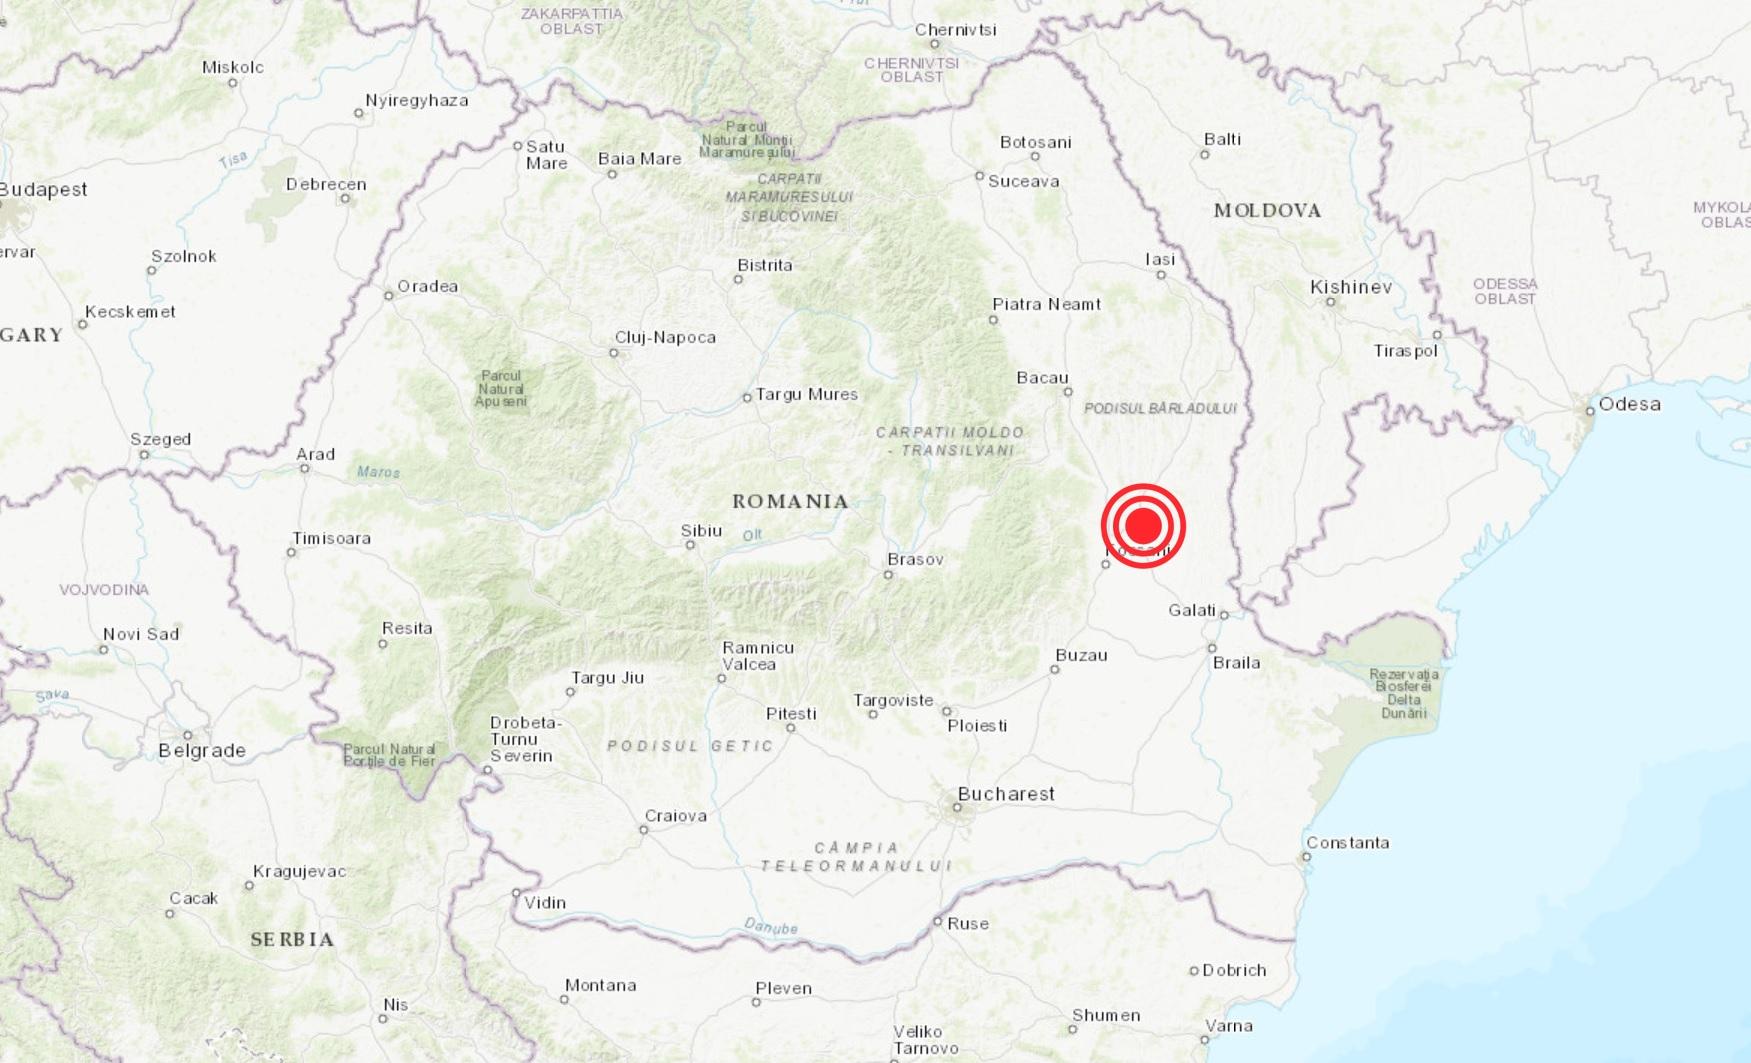 cutremur în corp hpv warts no big deal